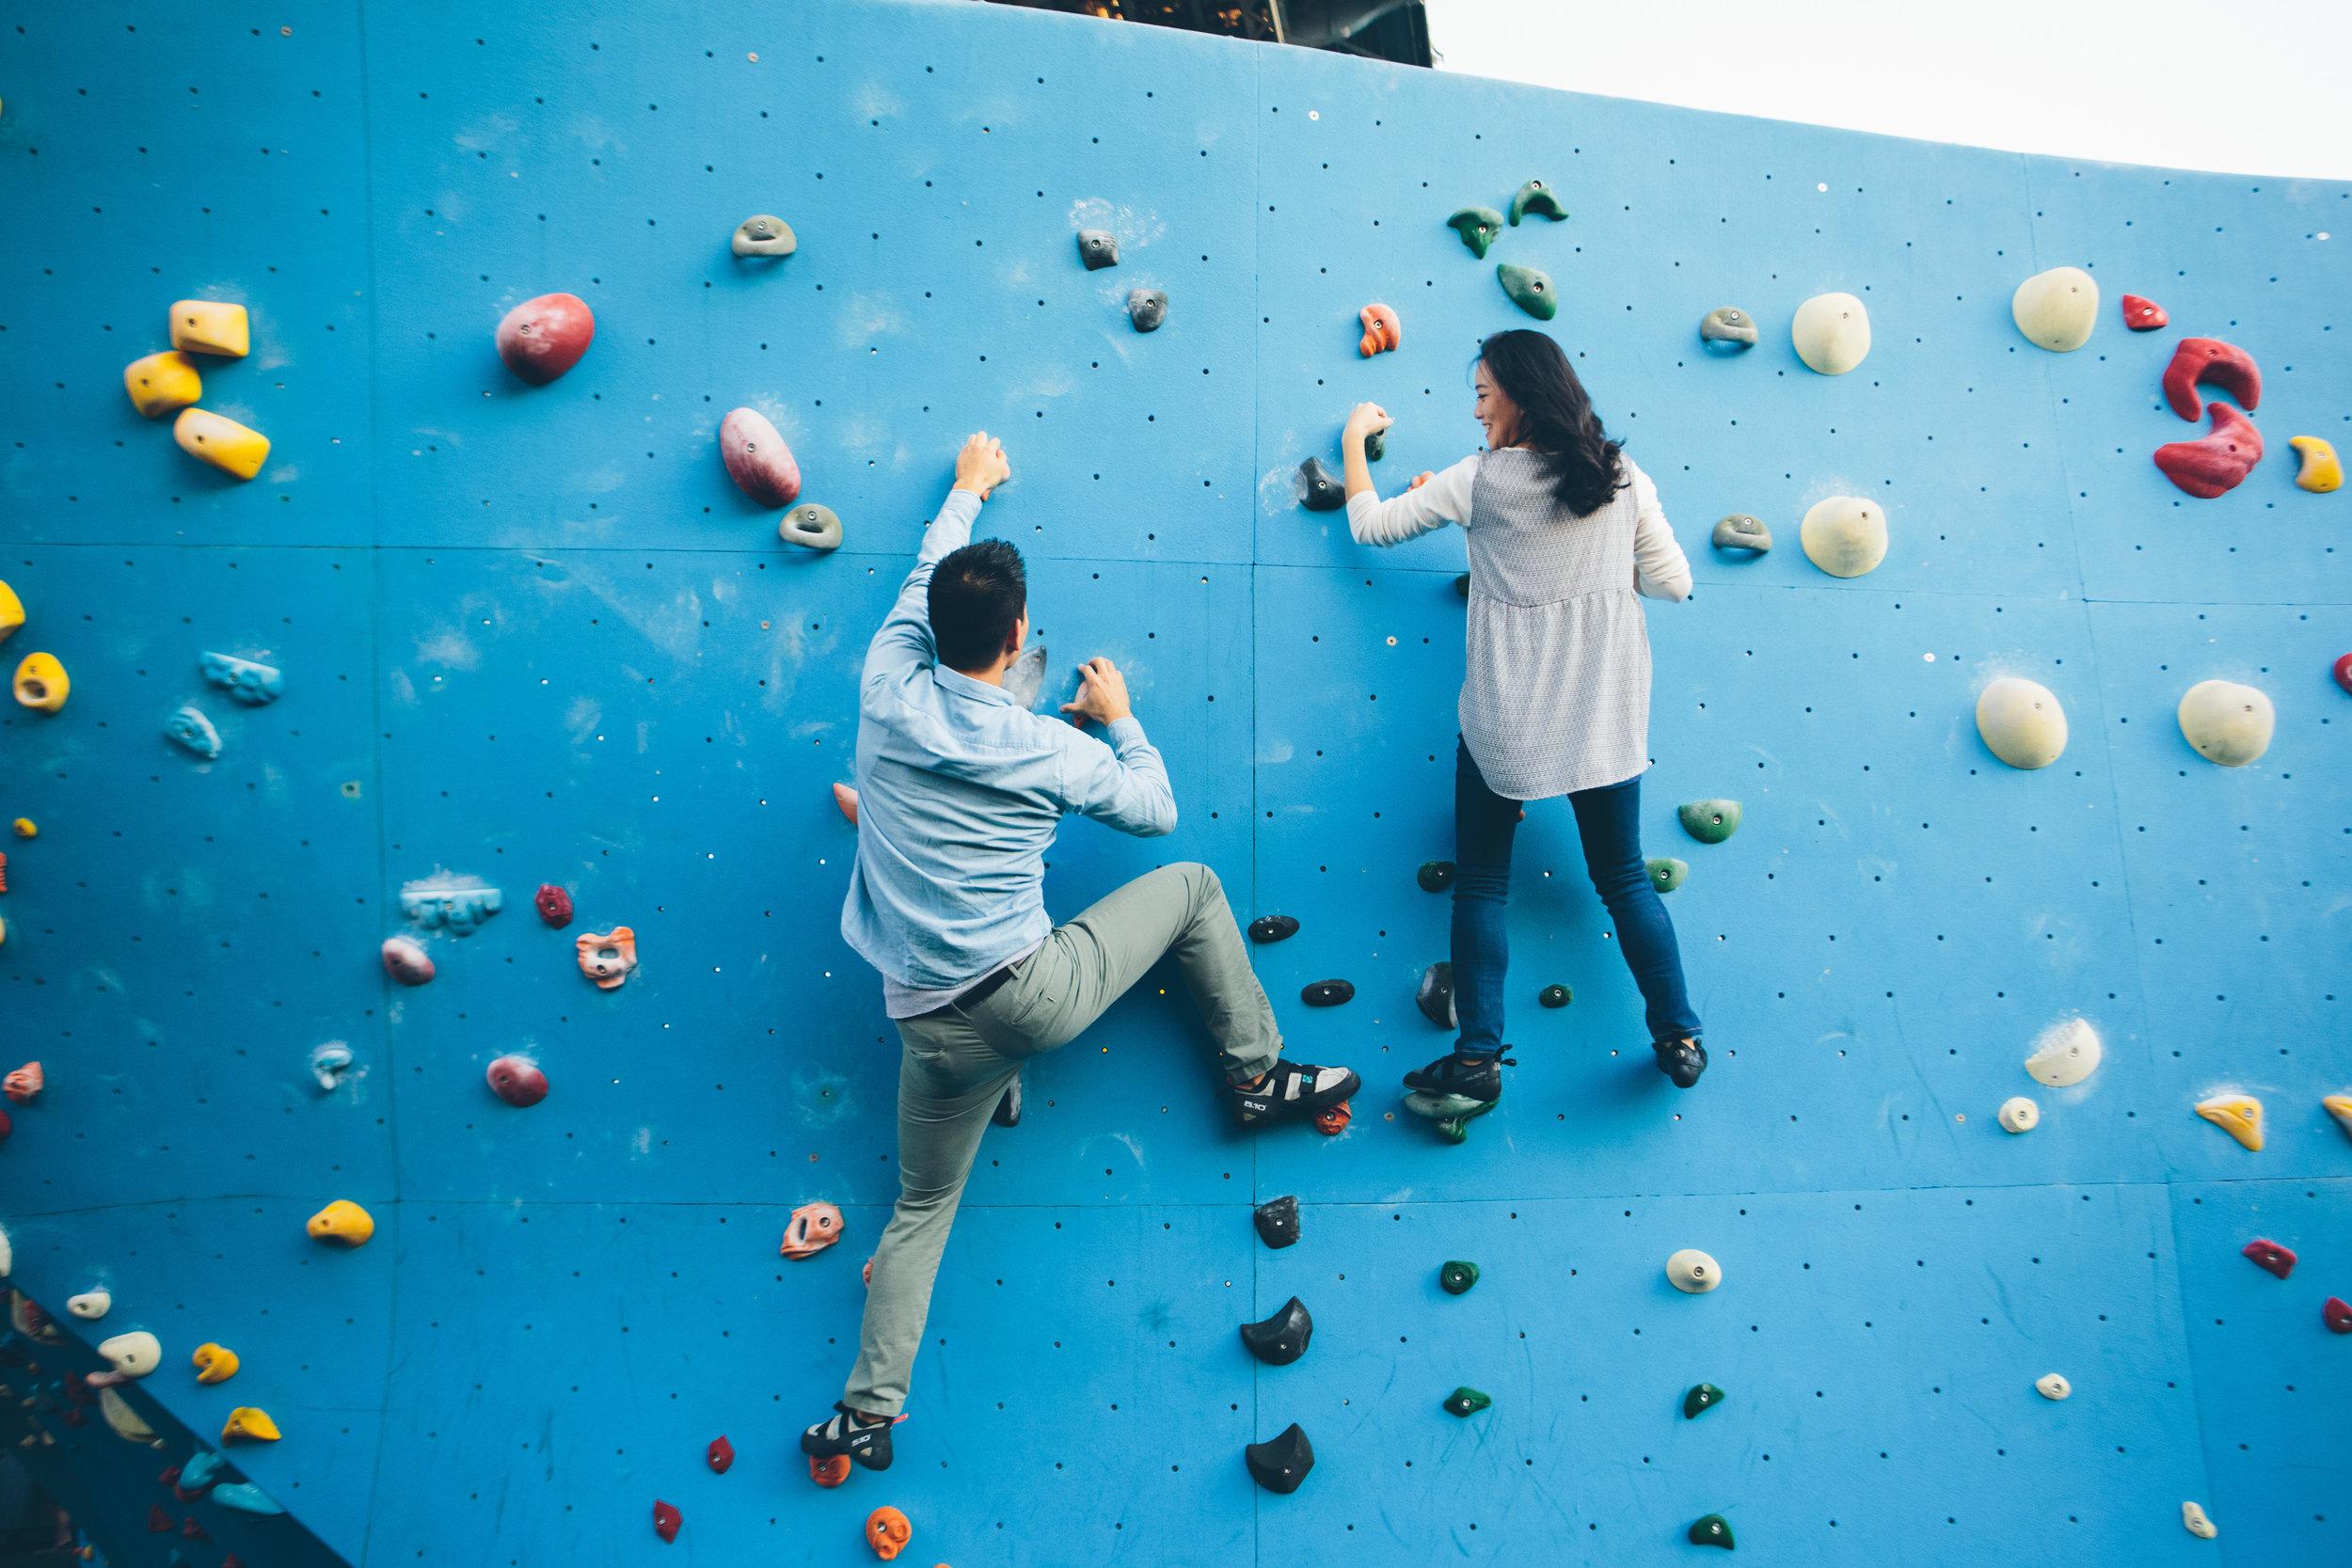 brooklyn boulders — New York City Wedding, Engagement